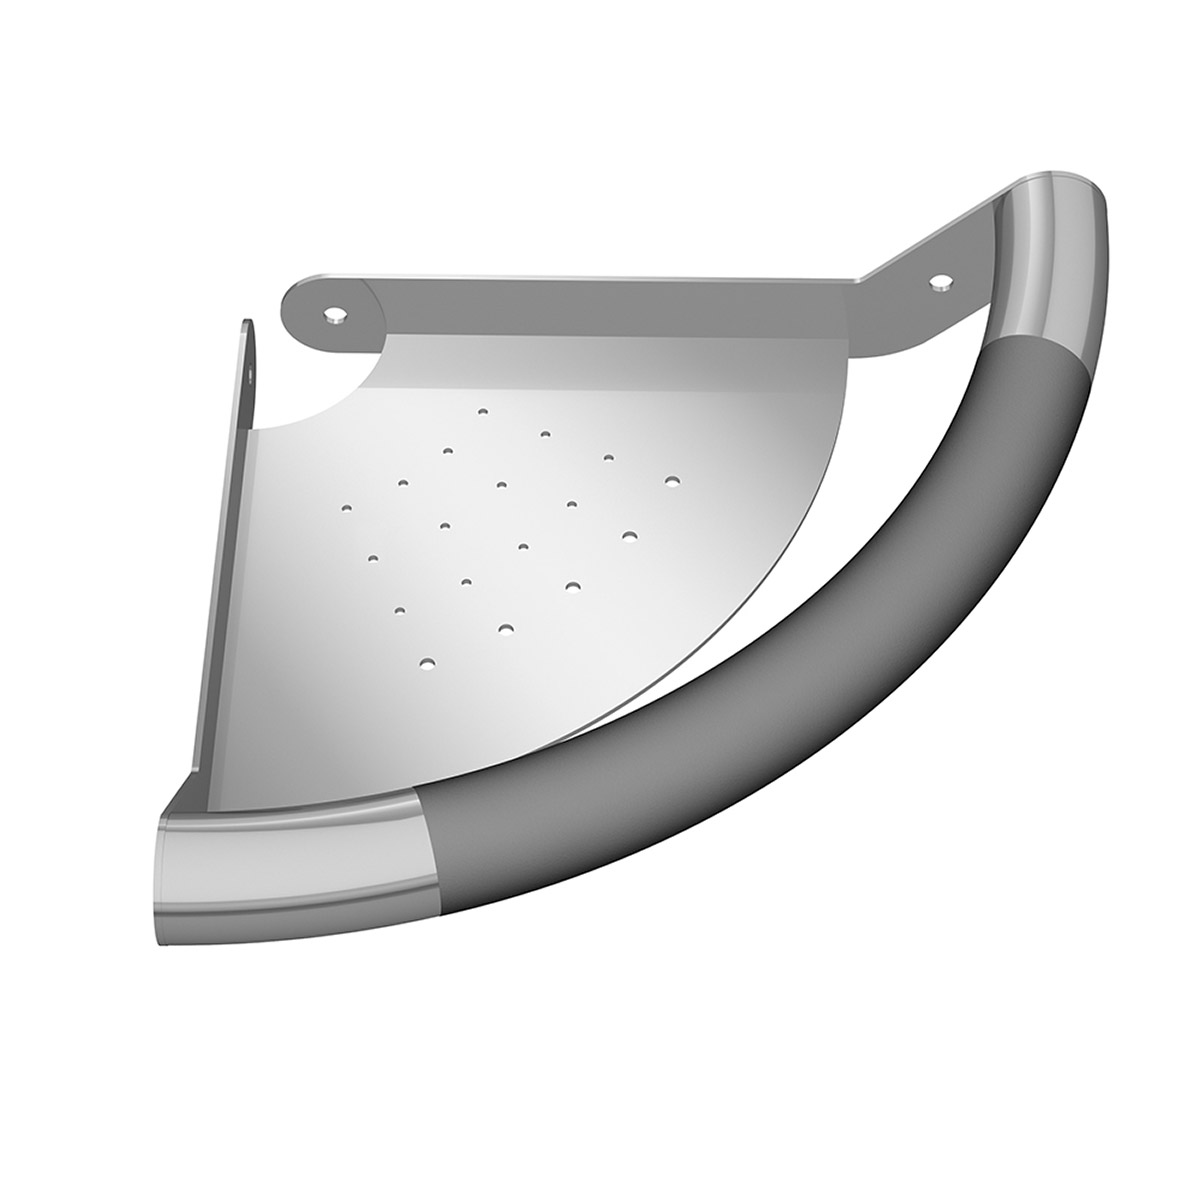 PULSE ShowerSpas ErgoCornerBar Stainless Steel Polished